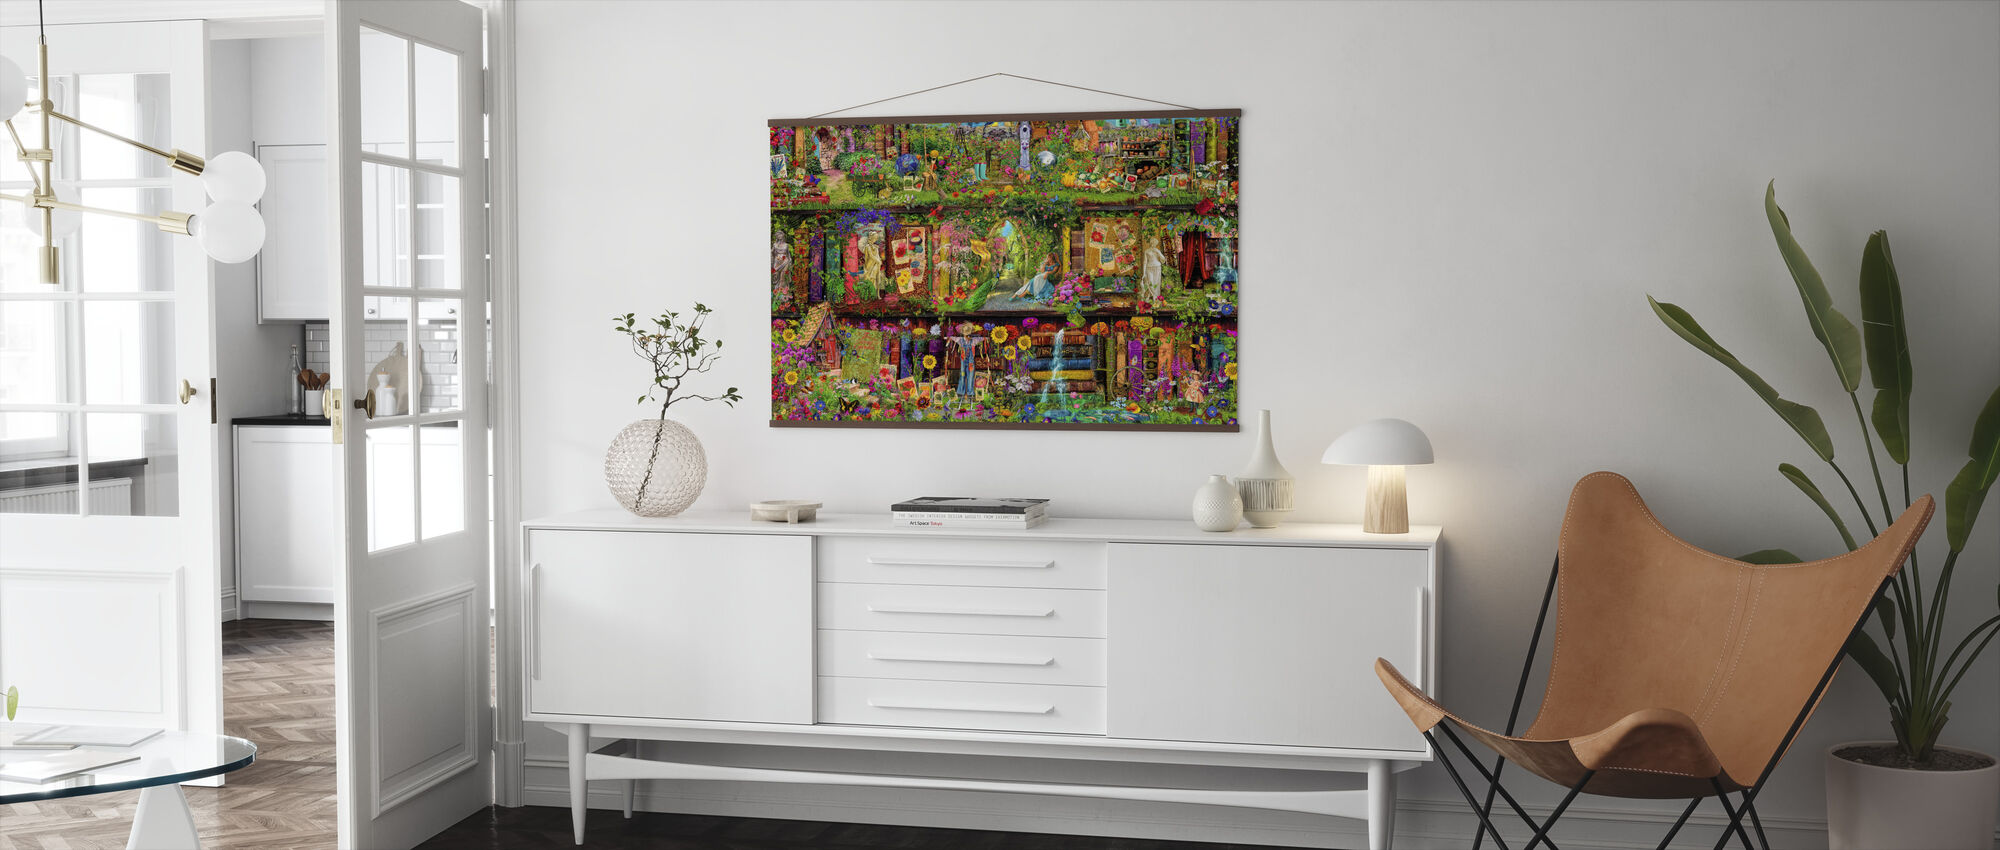 The Garden Shelf Modne Plakaty Photowall